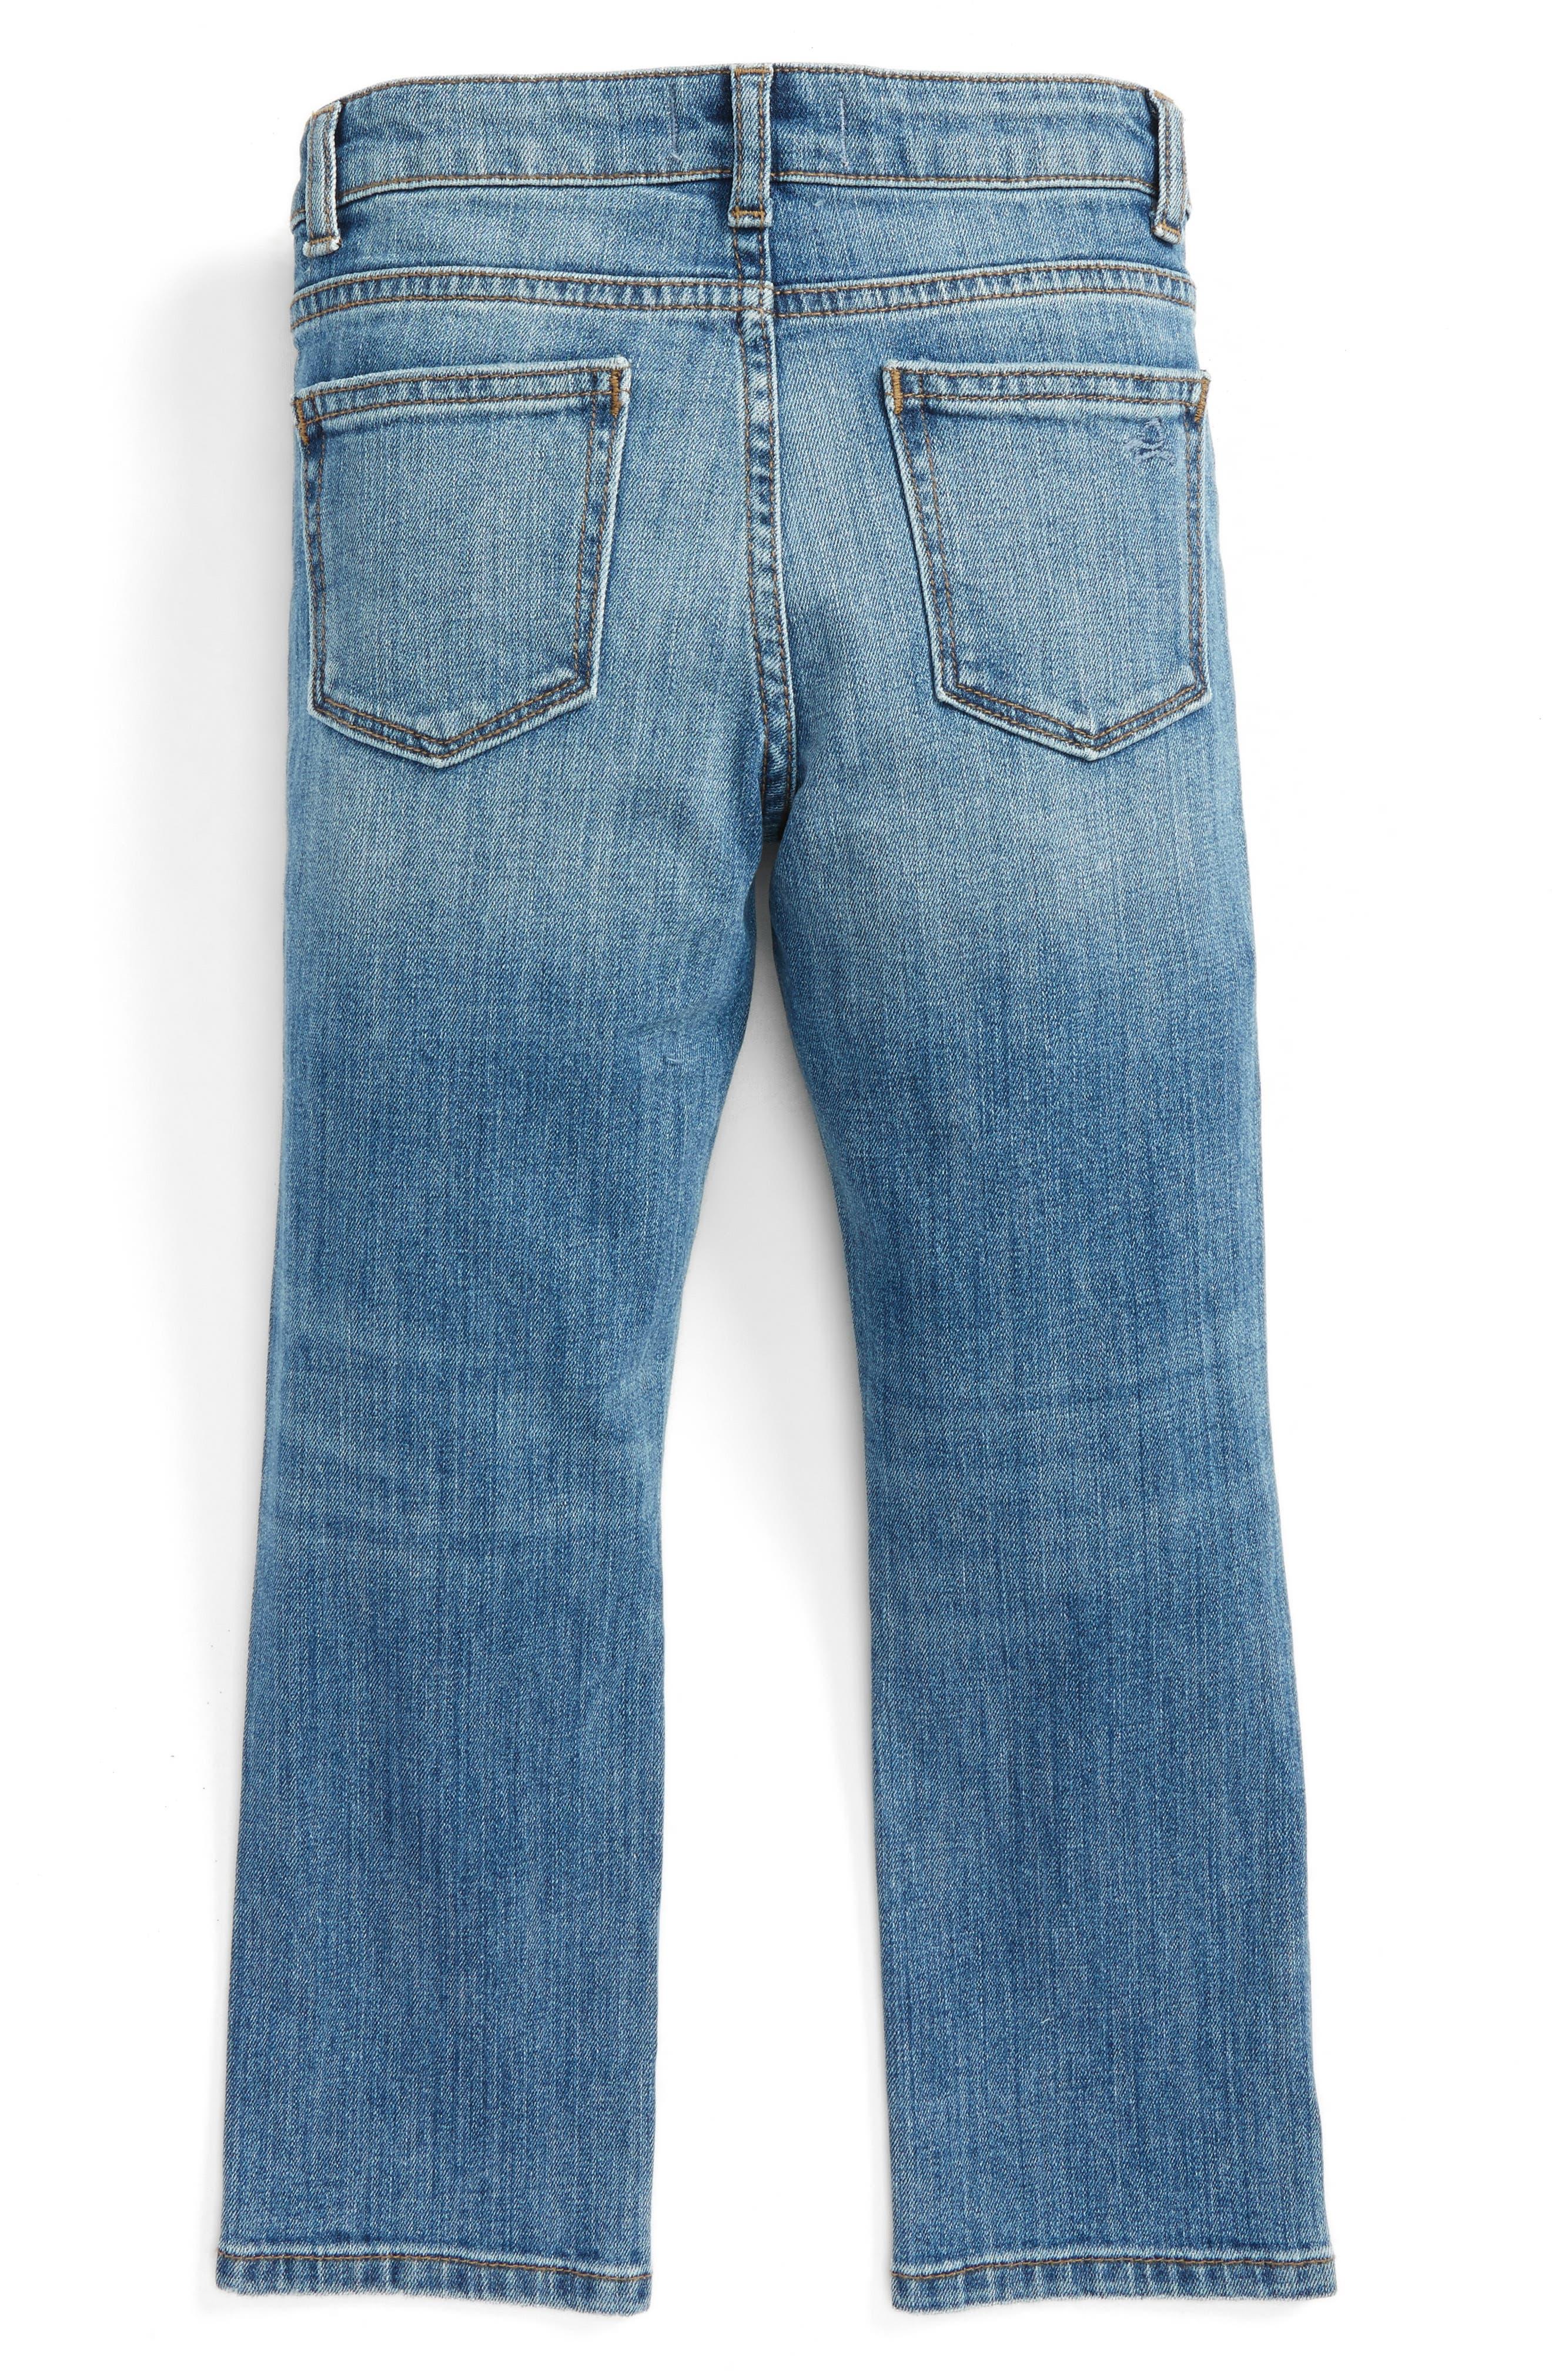 Brady Slim Fit Jeans,                             Alternate thumbnail 2, color,                             Rafter